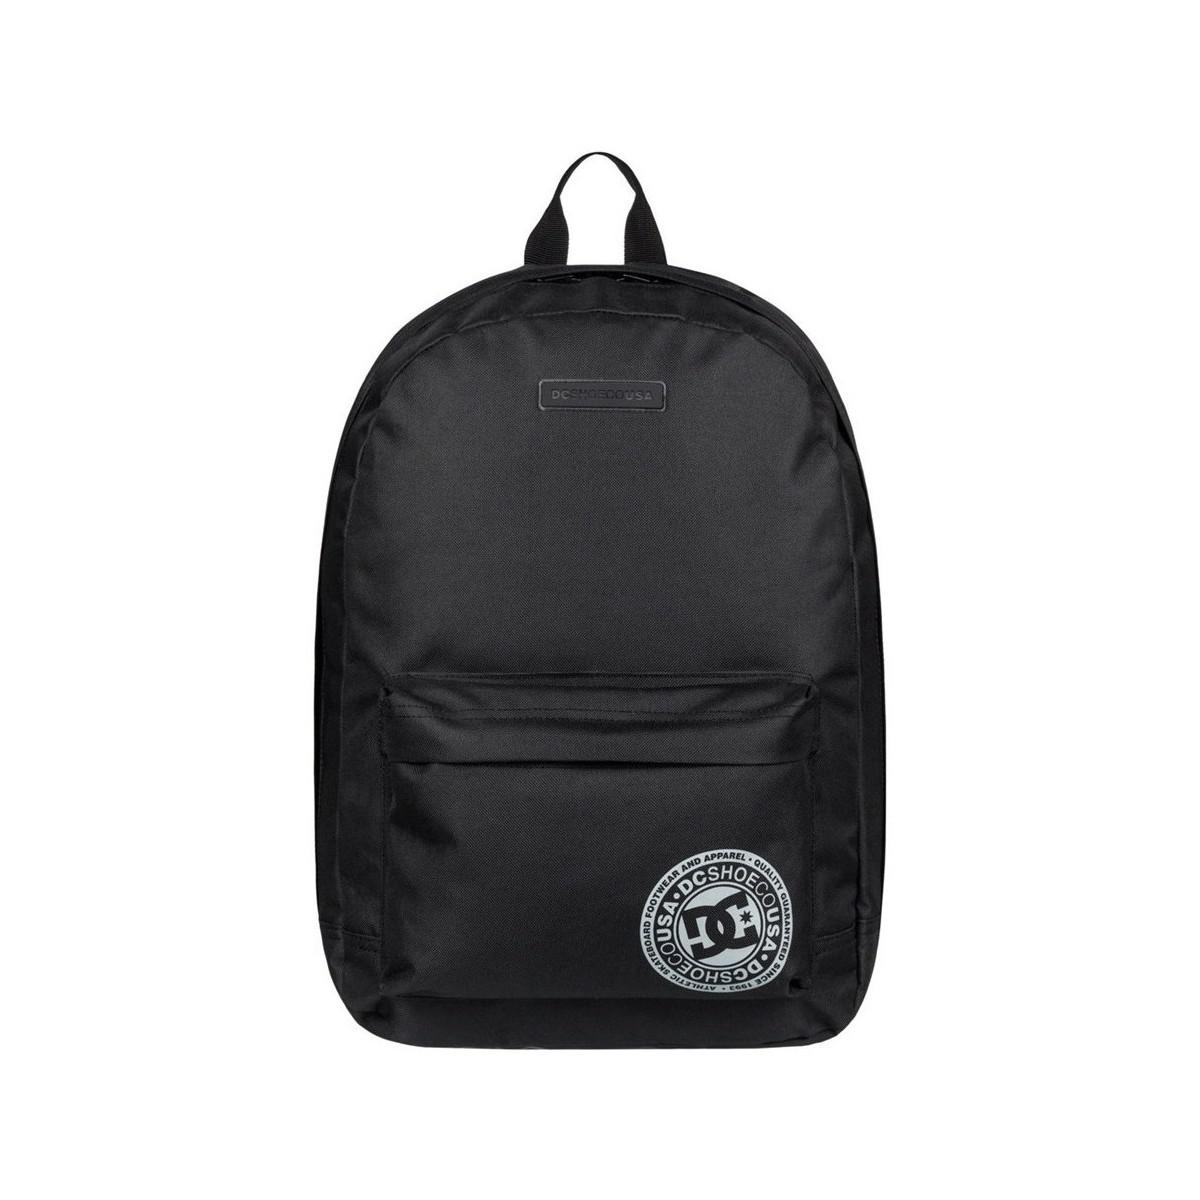 e4f453c7fbc Dc Shoes Backstack Women s Backpack In Black in Black for Men - Lyst